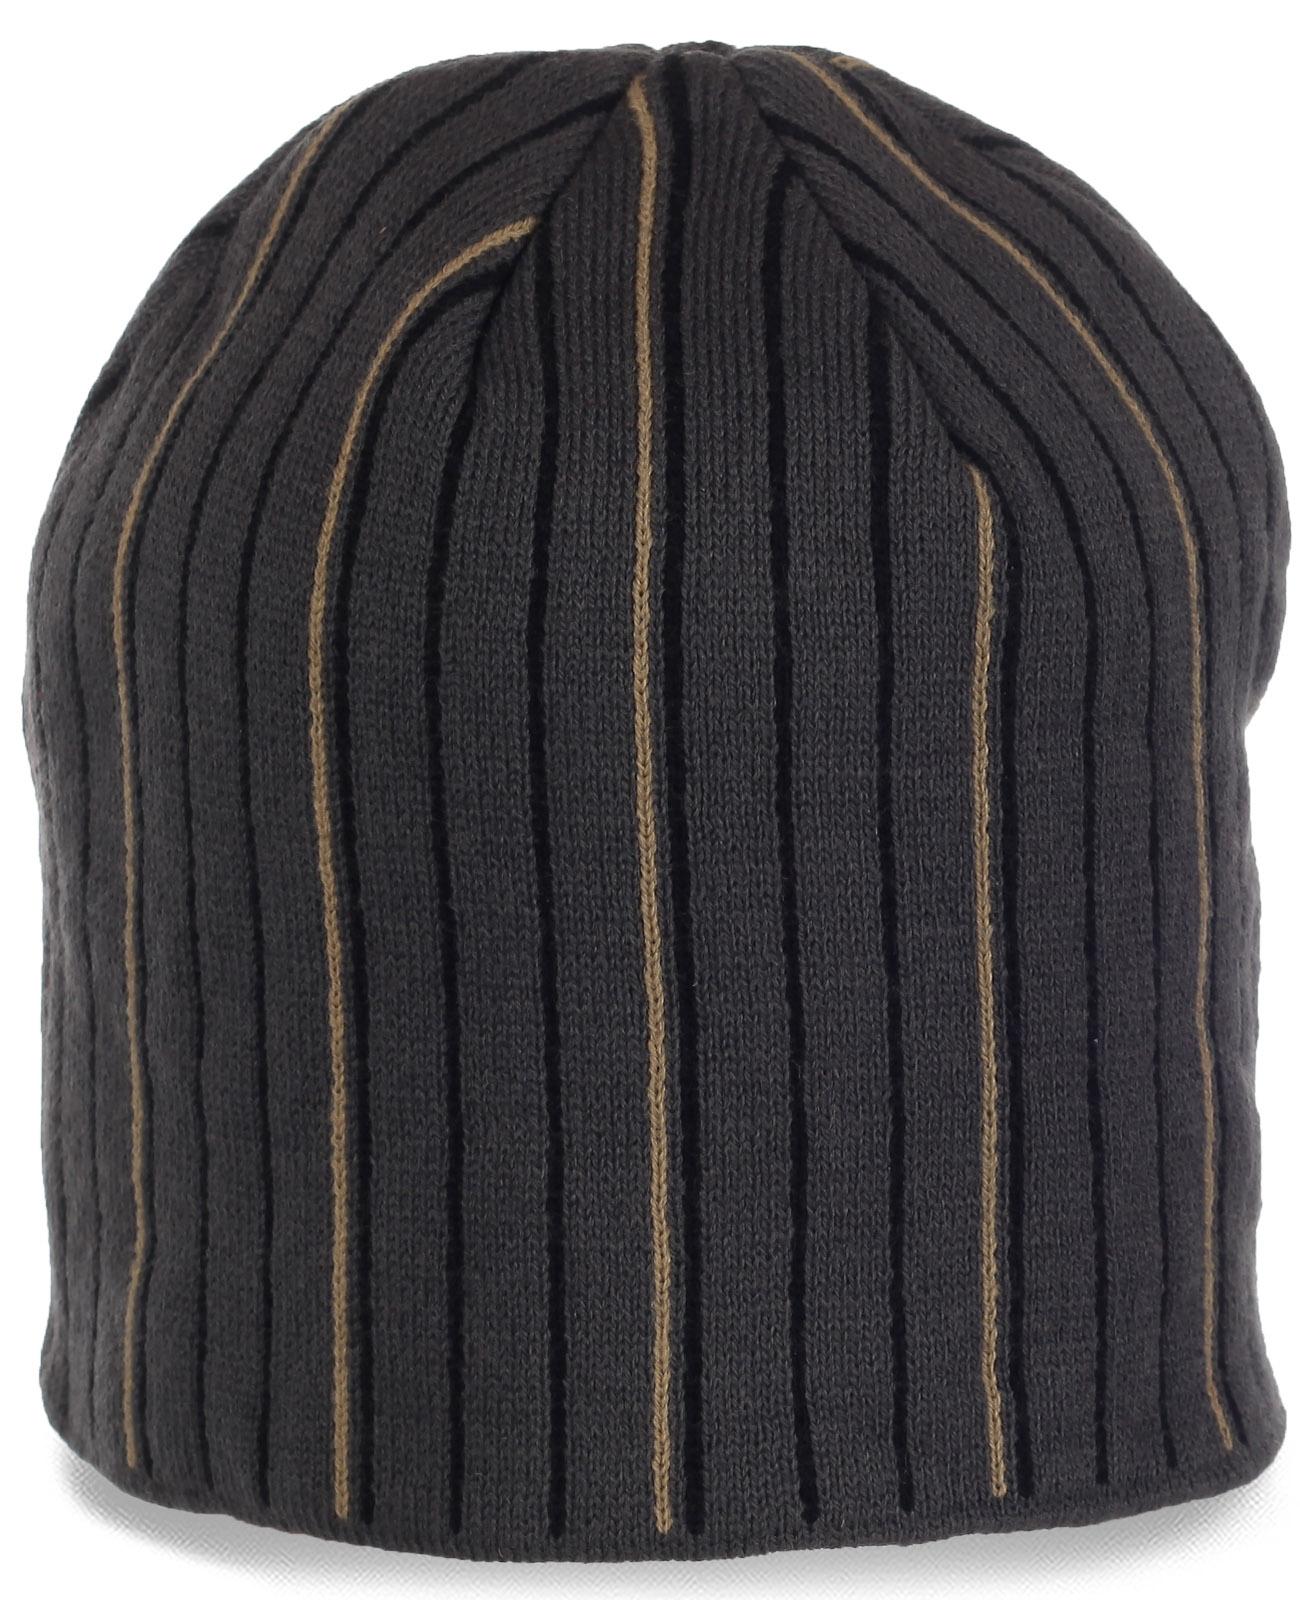 Строгая мужская шапка